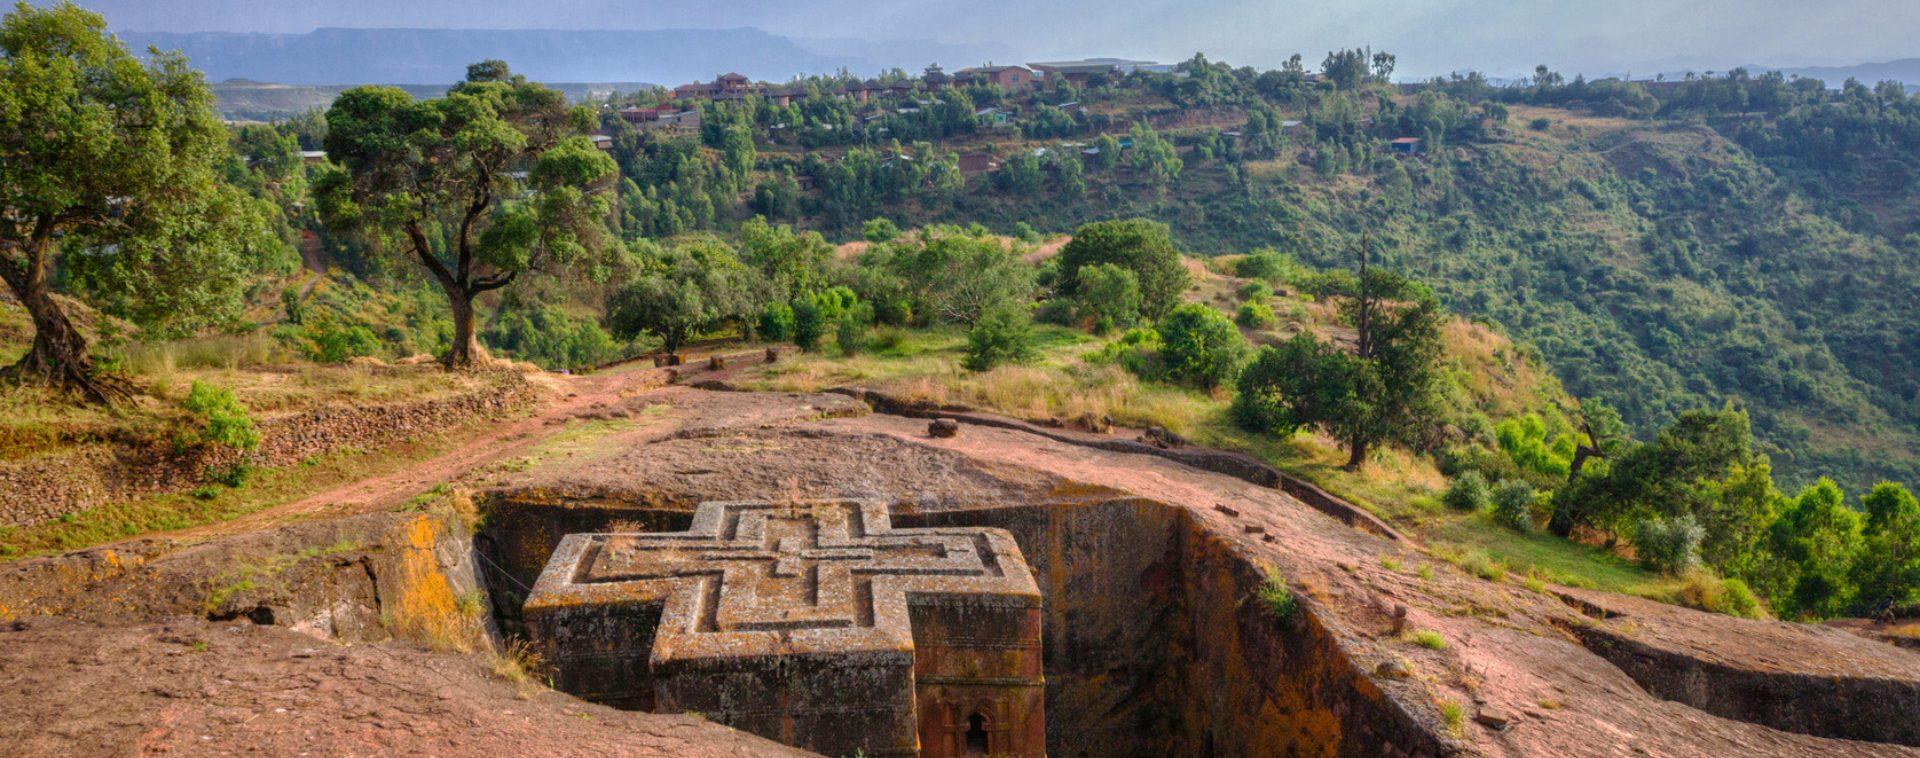 Ethiopie - Les Matins du Monde